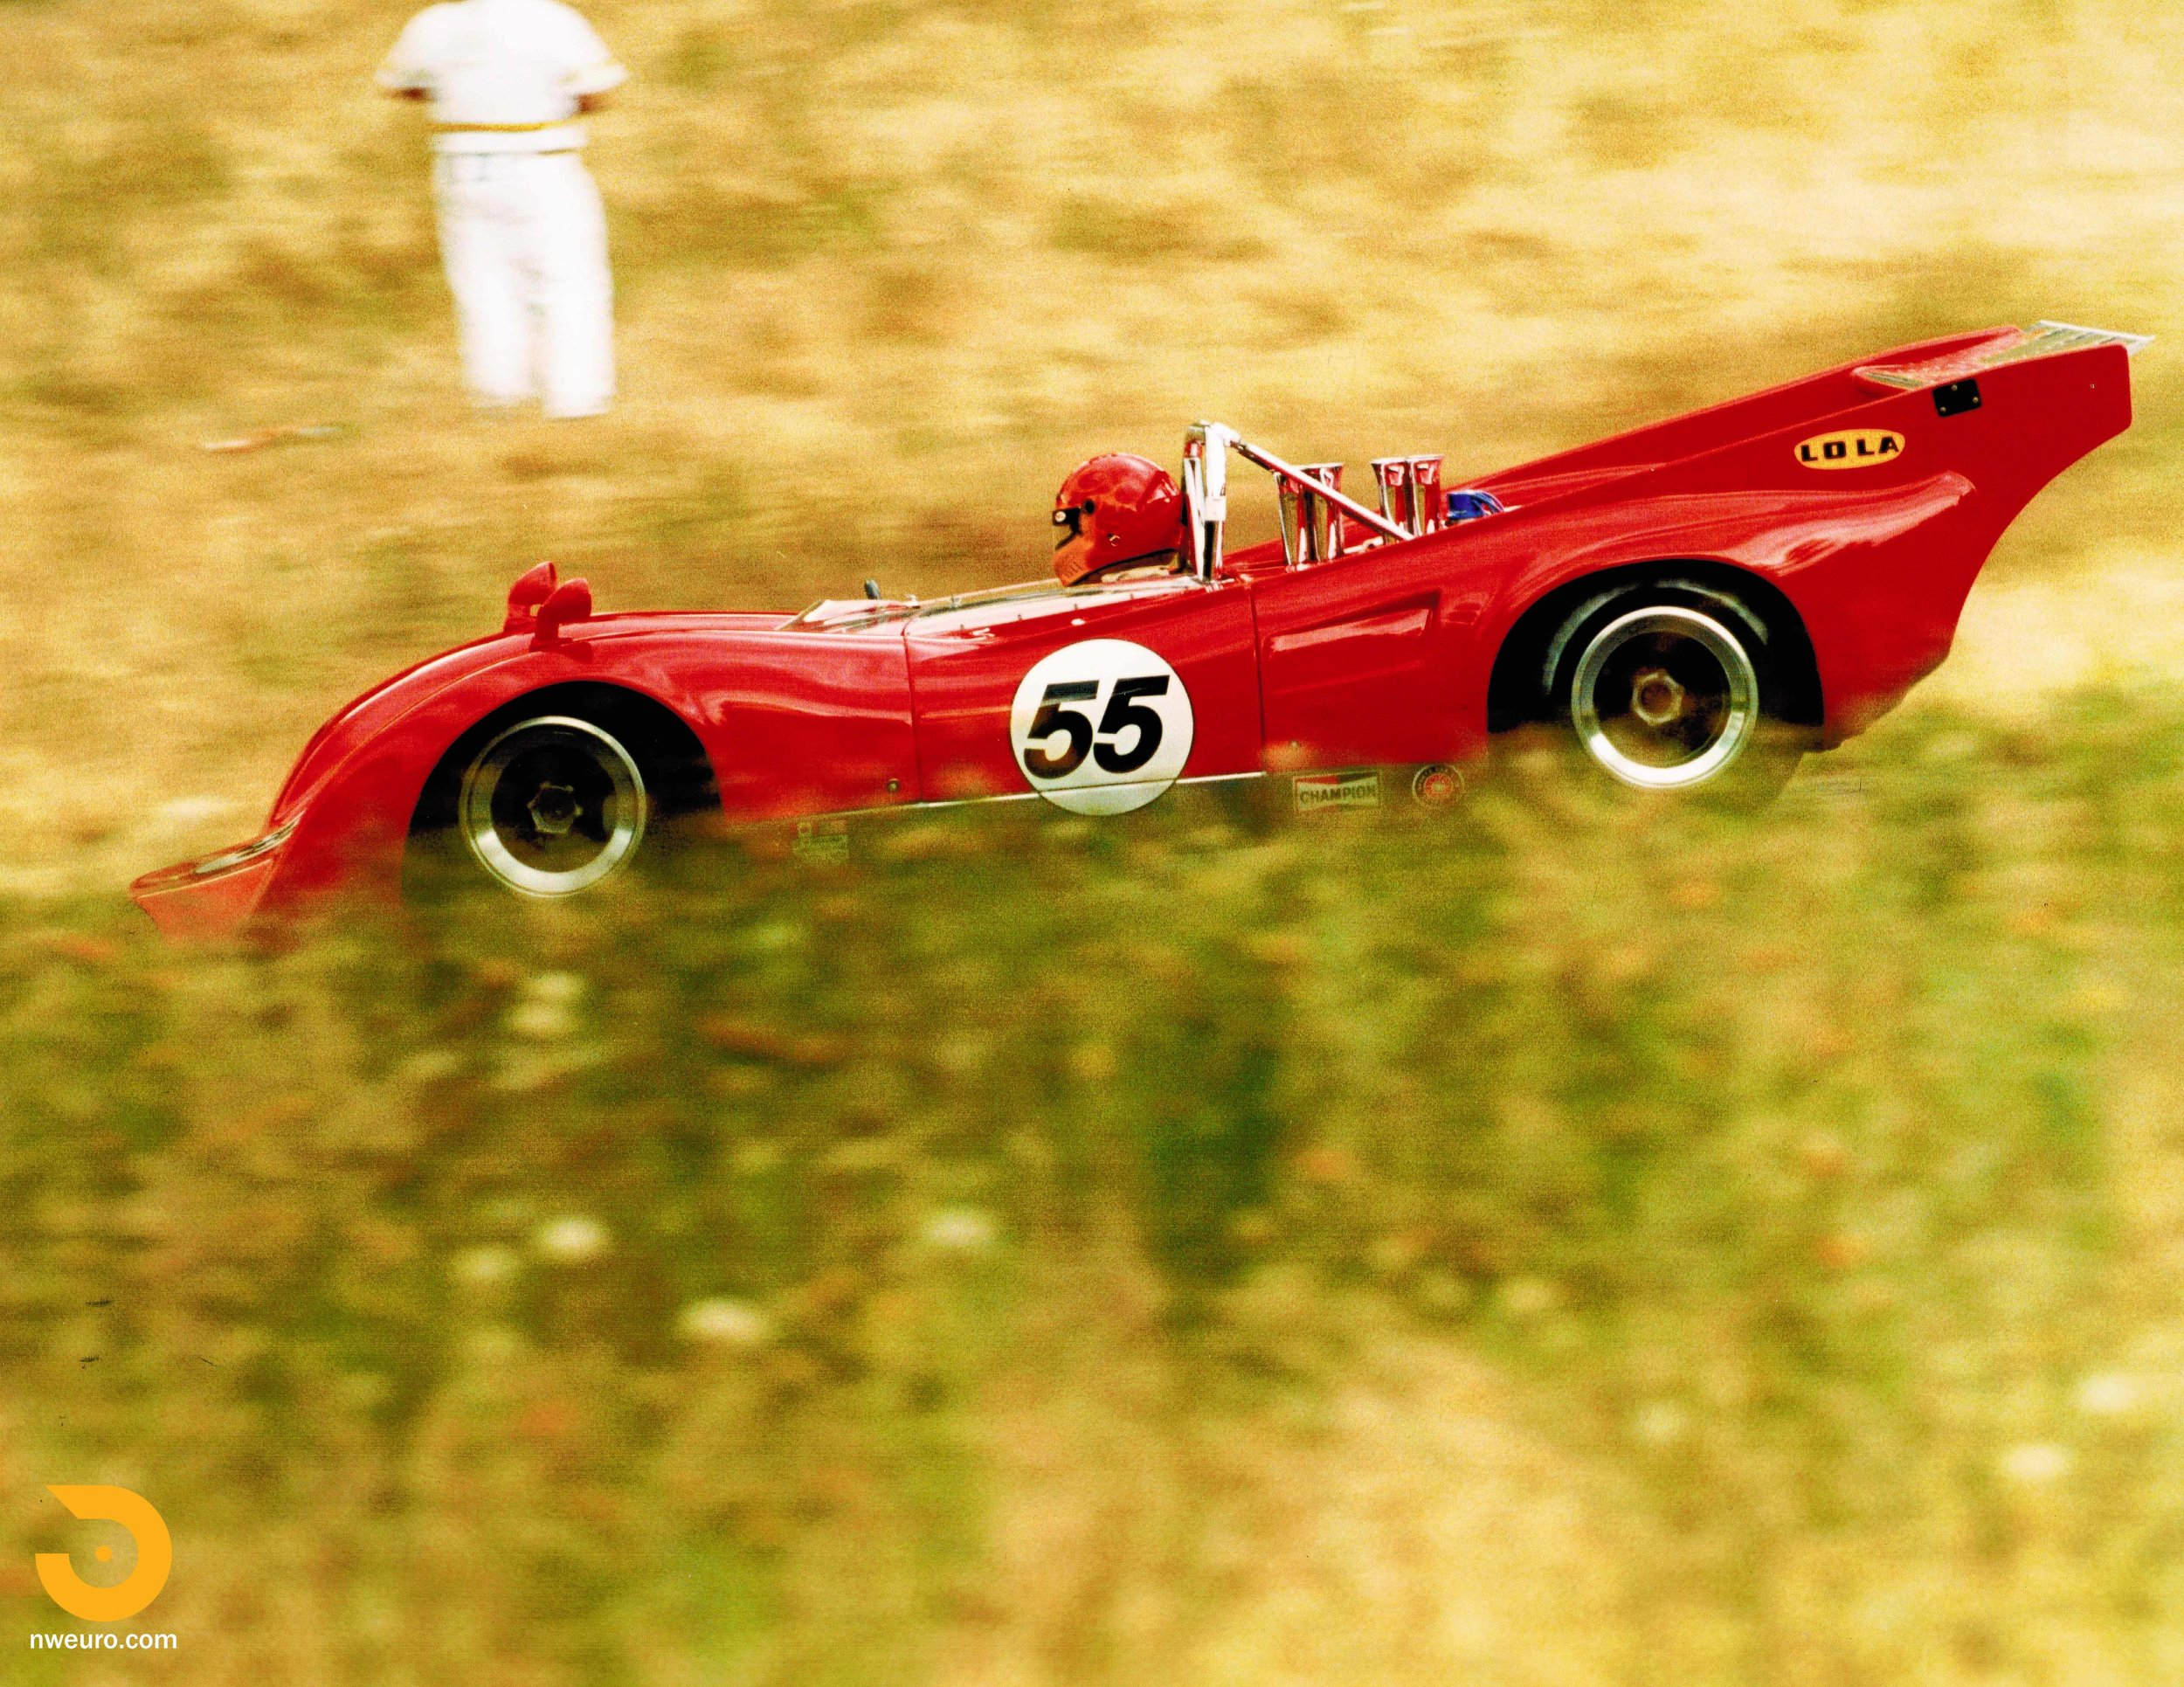 1969 Lola T162 Can-Am Race Car Action Shots-9.jpg